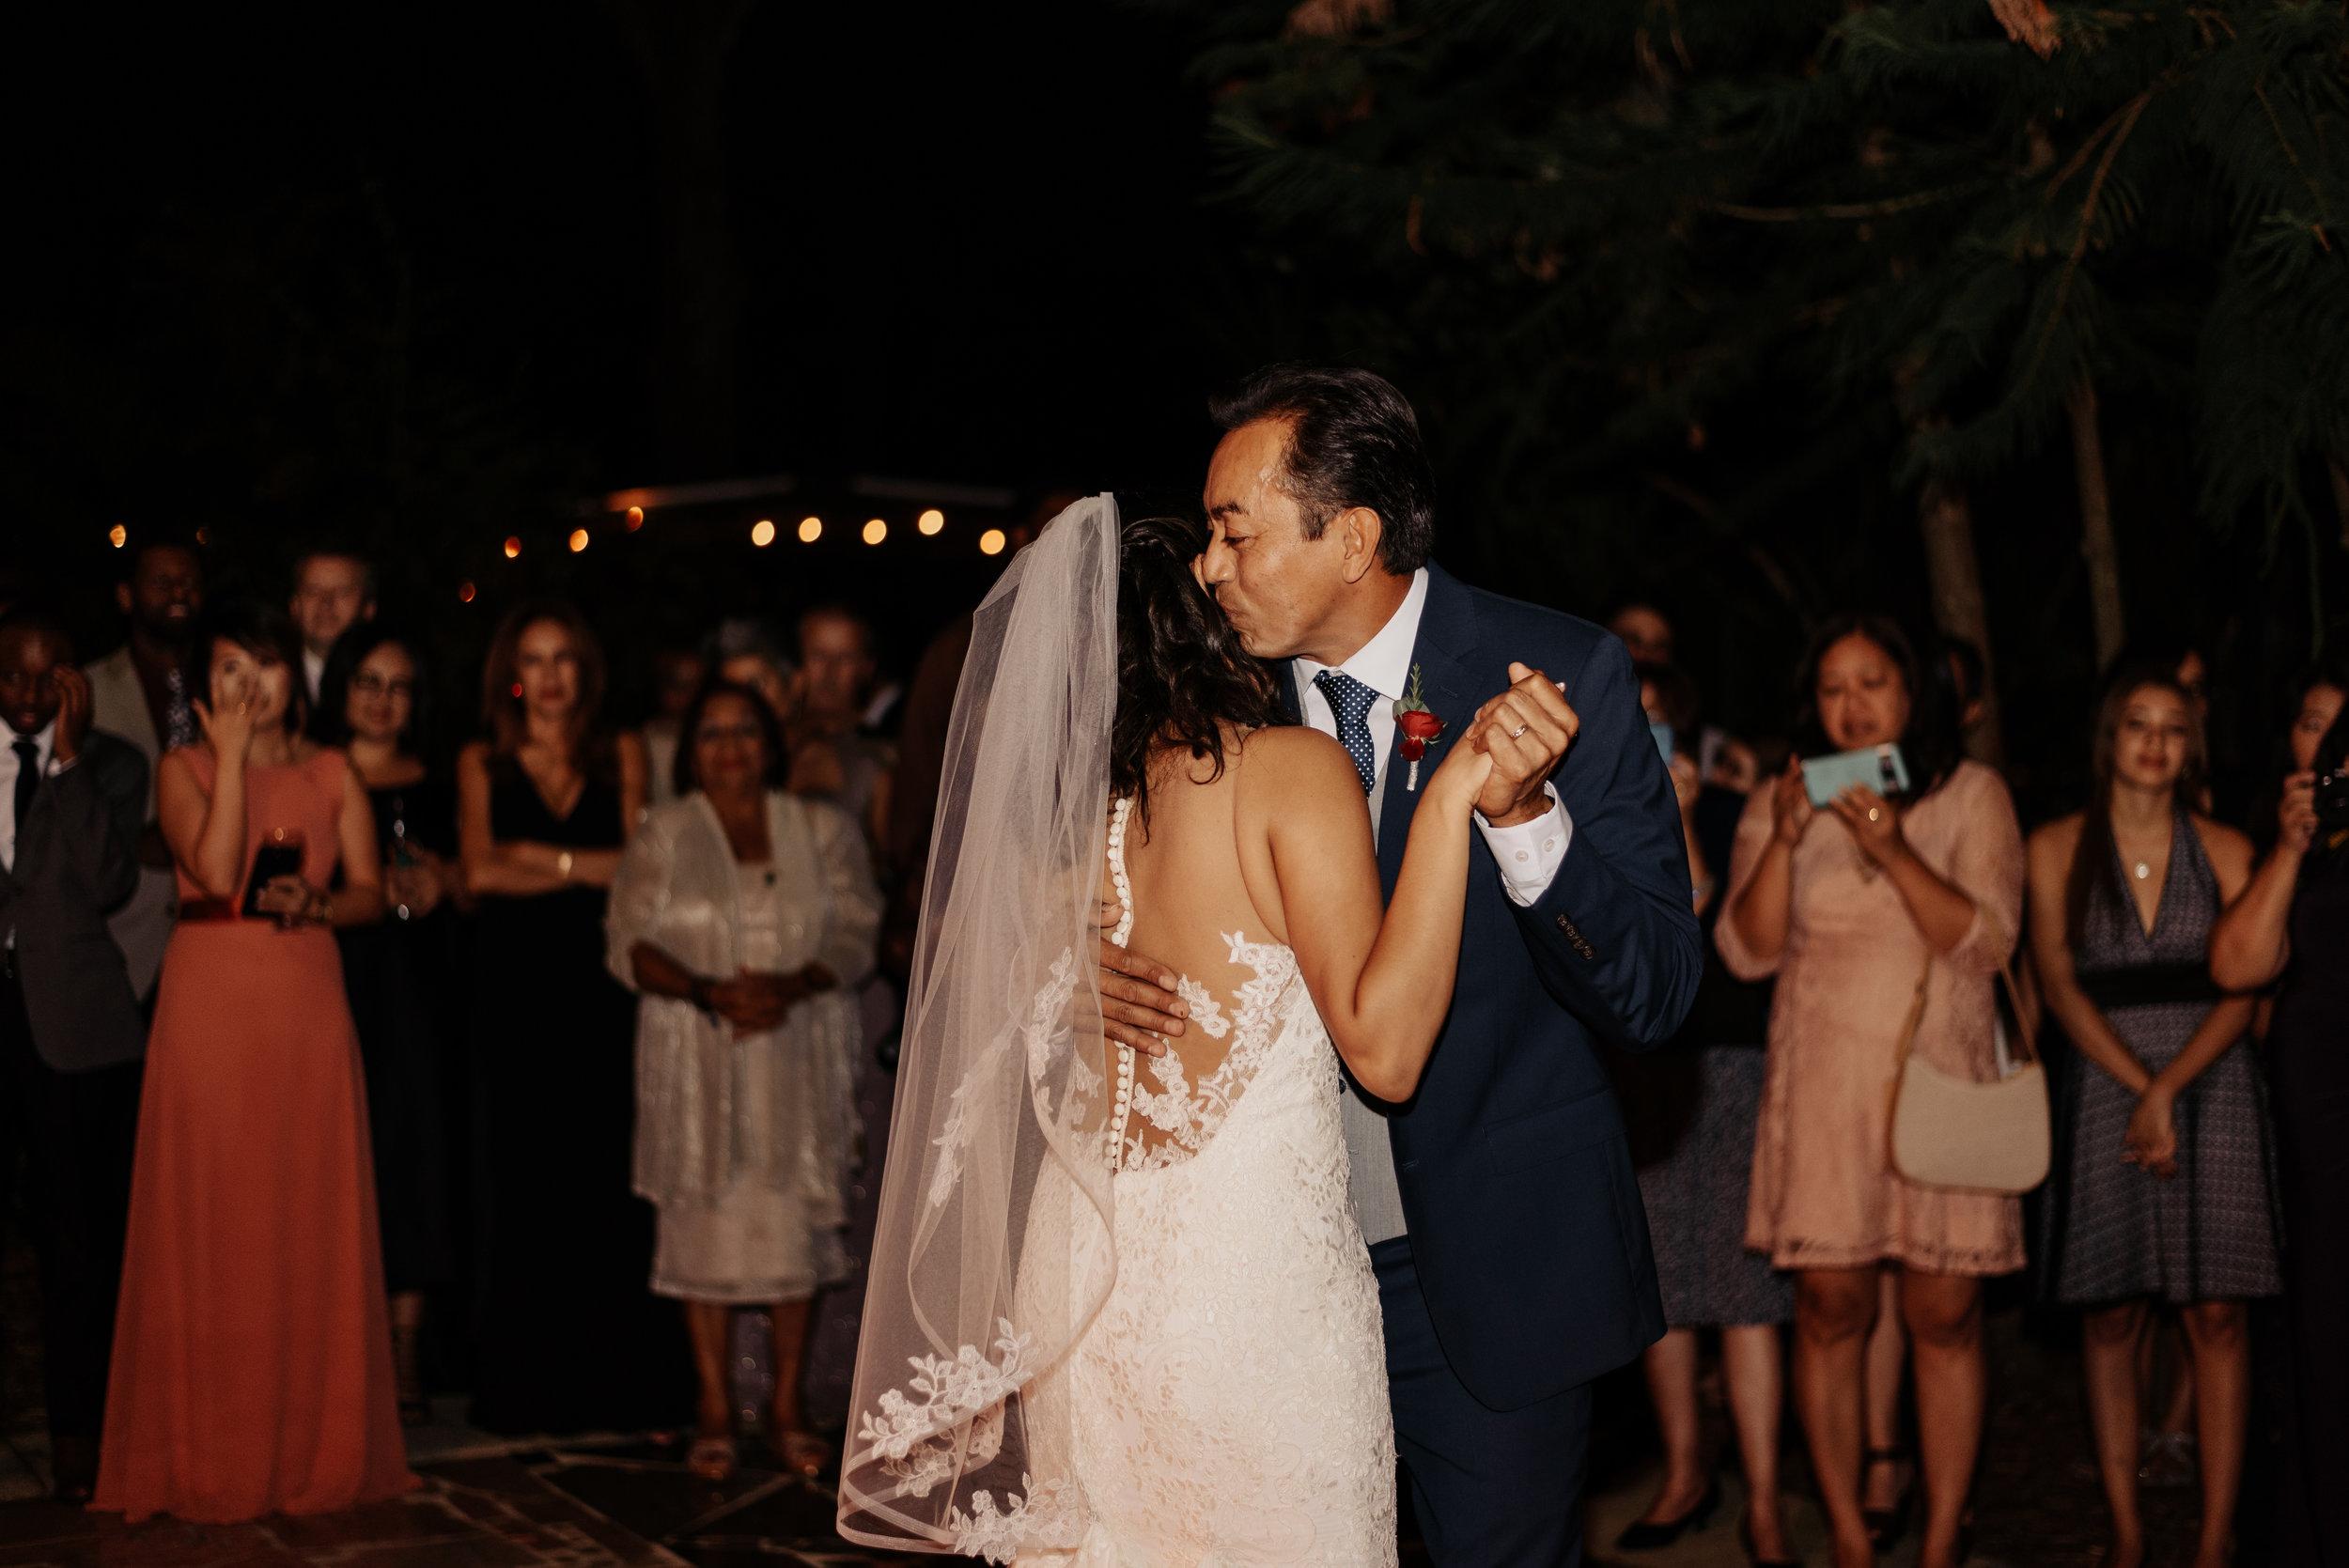 Kirstie-AJ-Wedding-9242.jpg